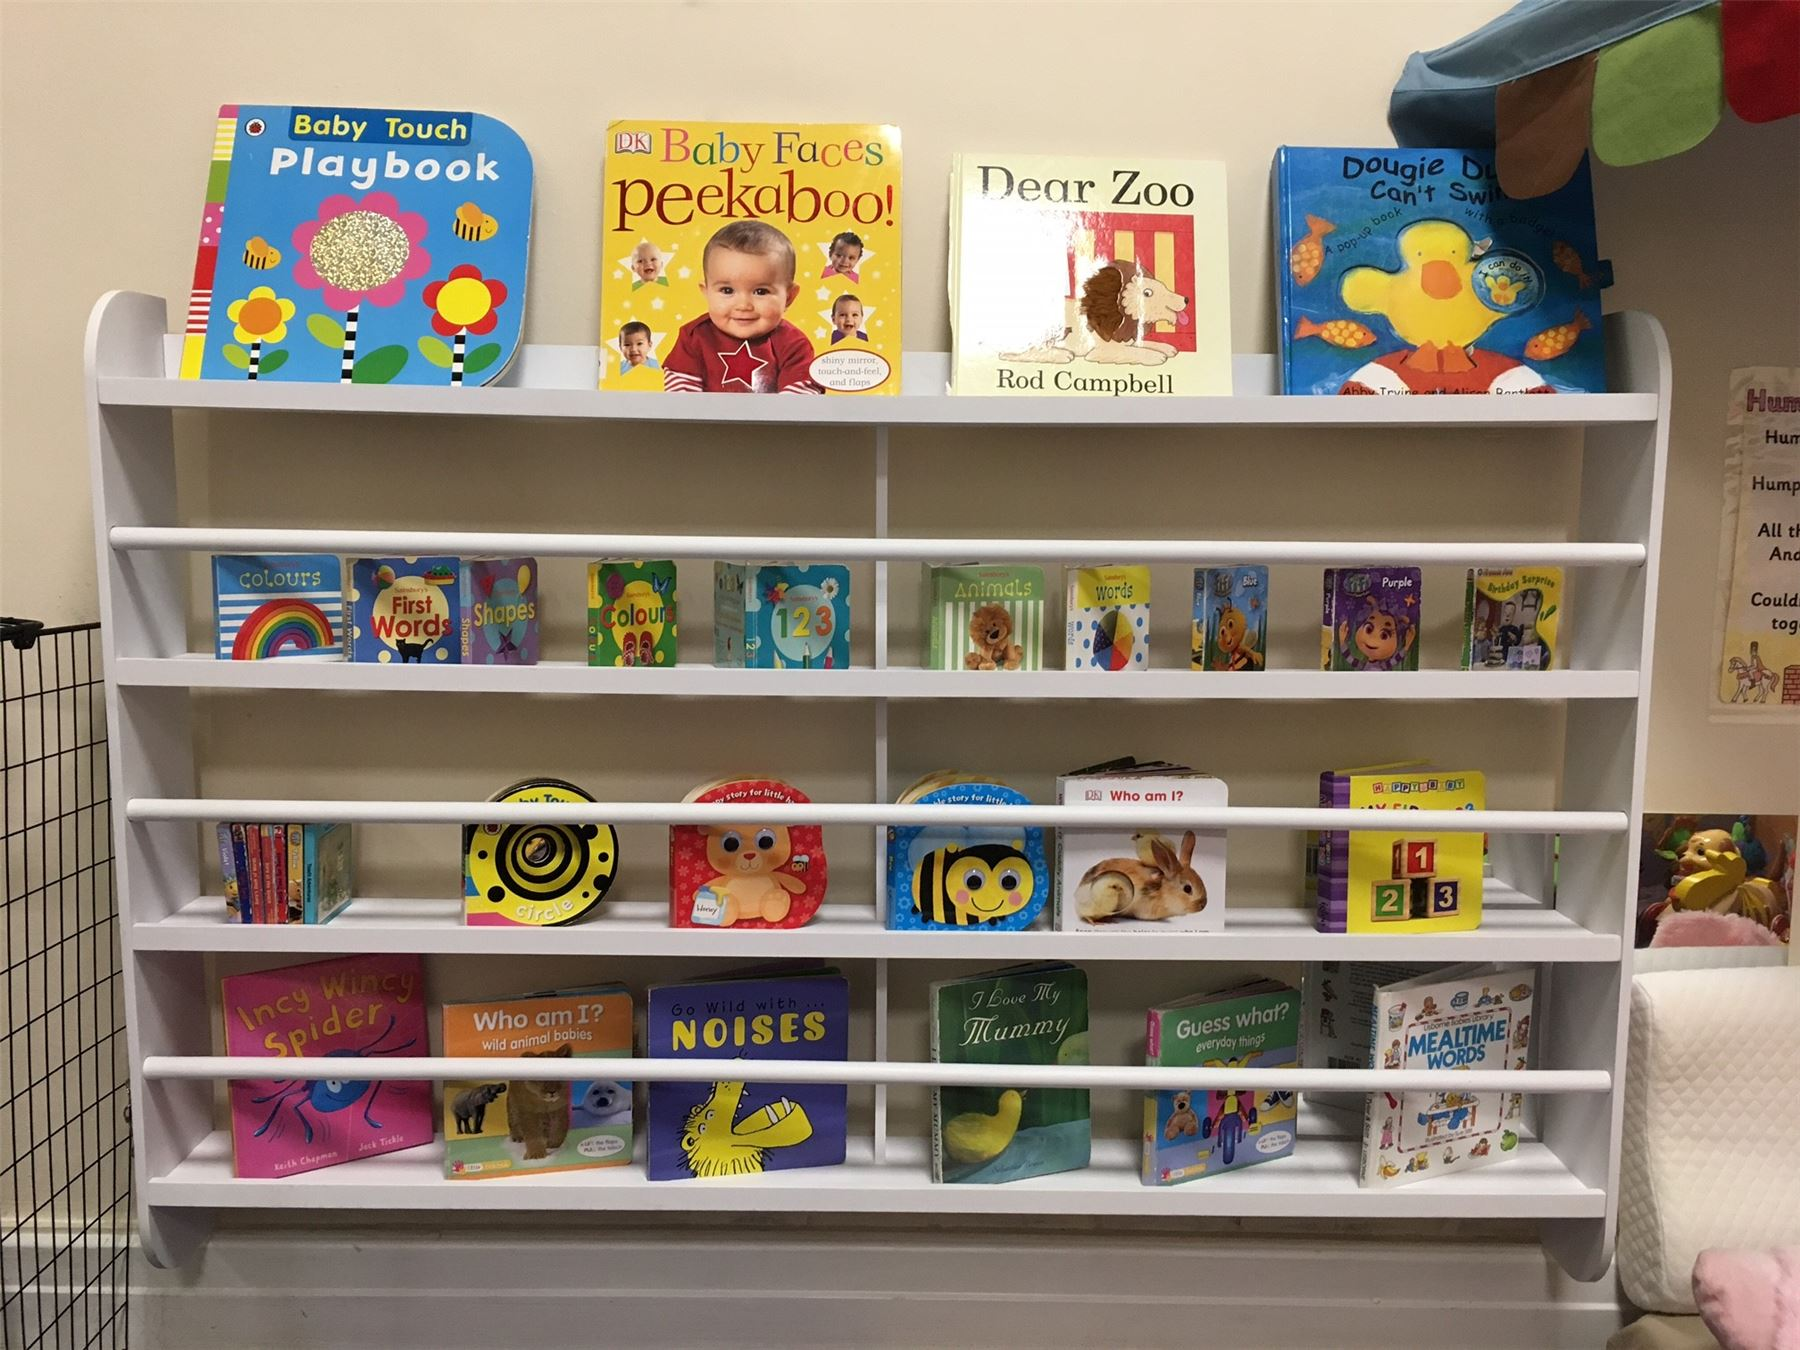 Details About Wall Bookshelf Bookcase Kids Children Books Shelf Storage Playroom Bedroom Rack